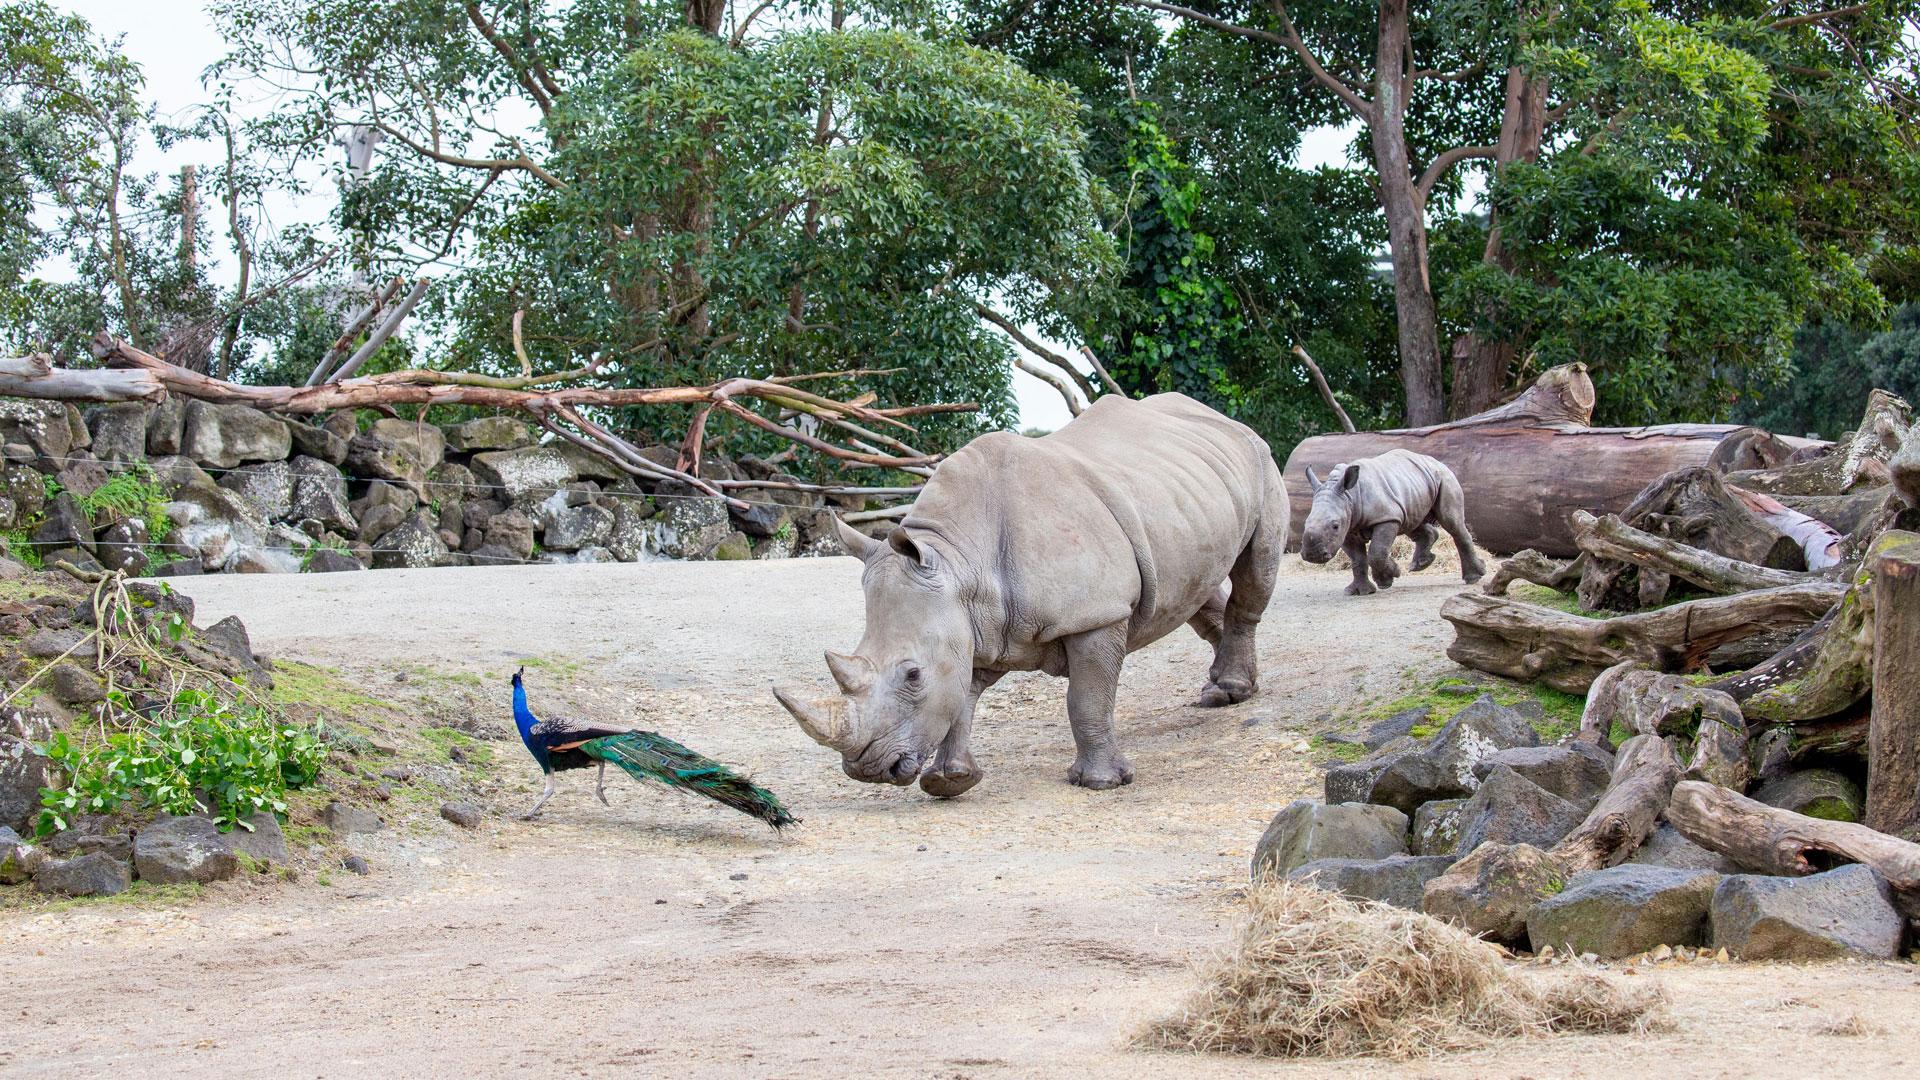 https://rfacdn.nz/zoo/assets/media/rhino-calf-in-habitat-gallery-5.jpg